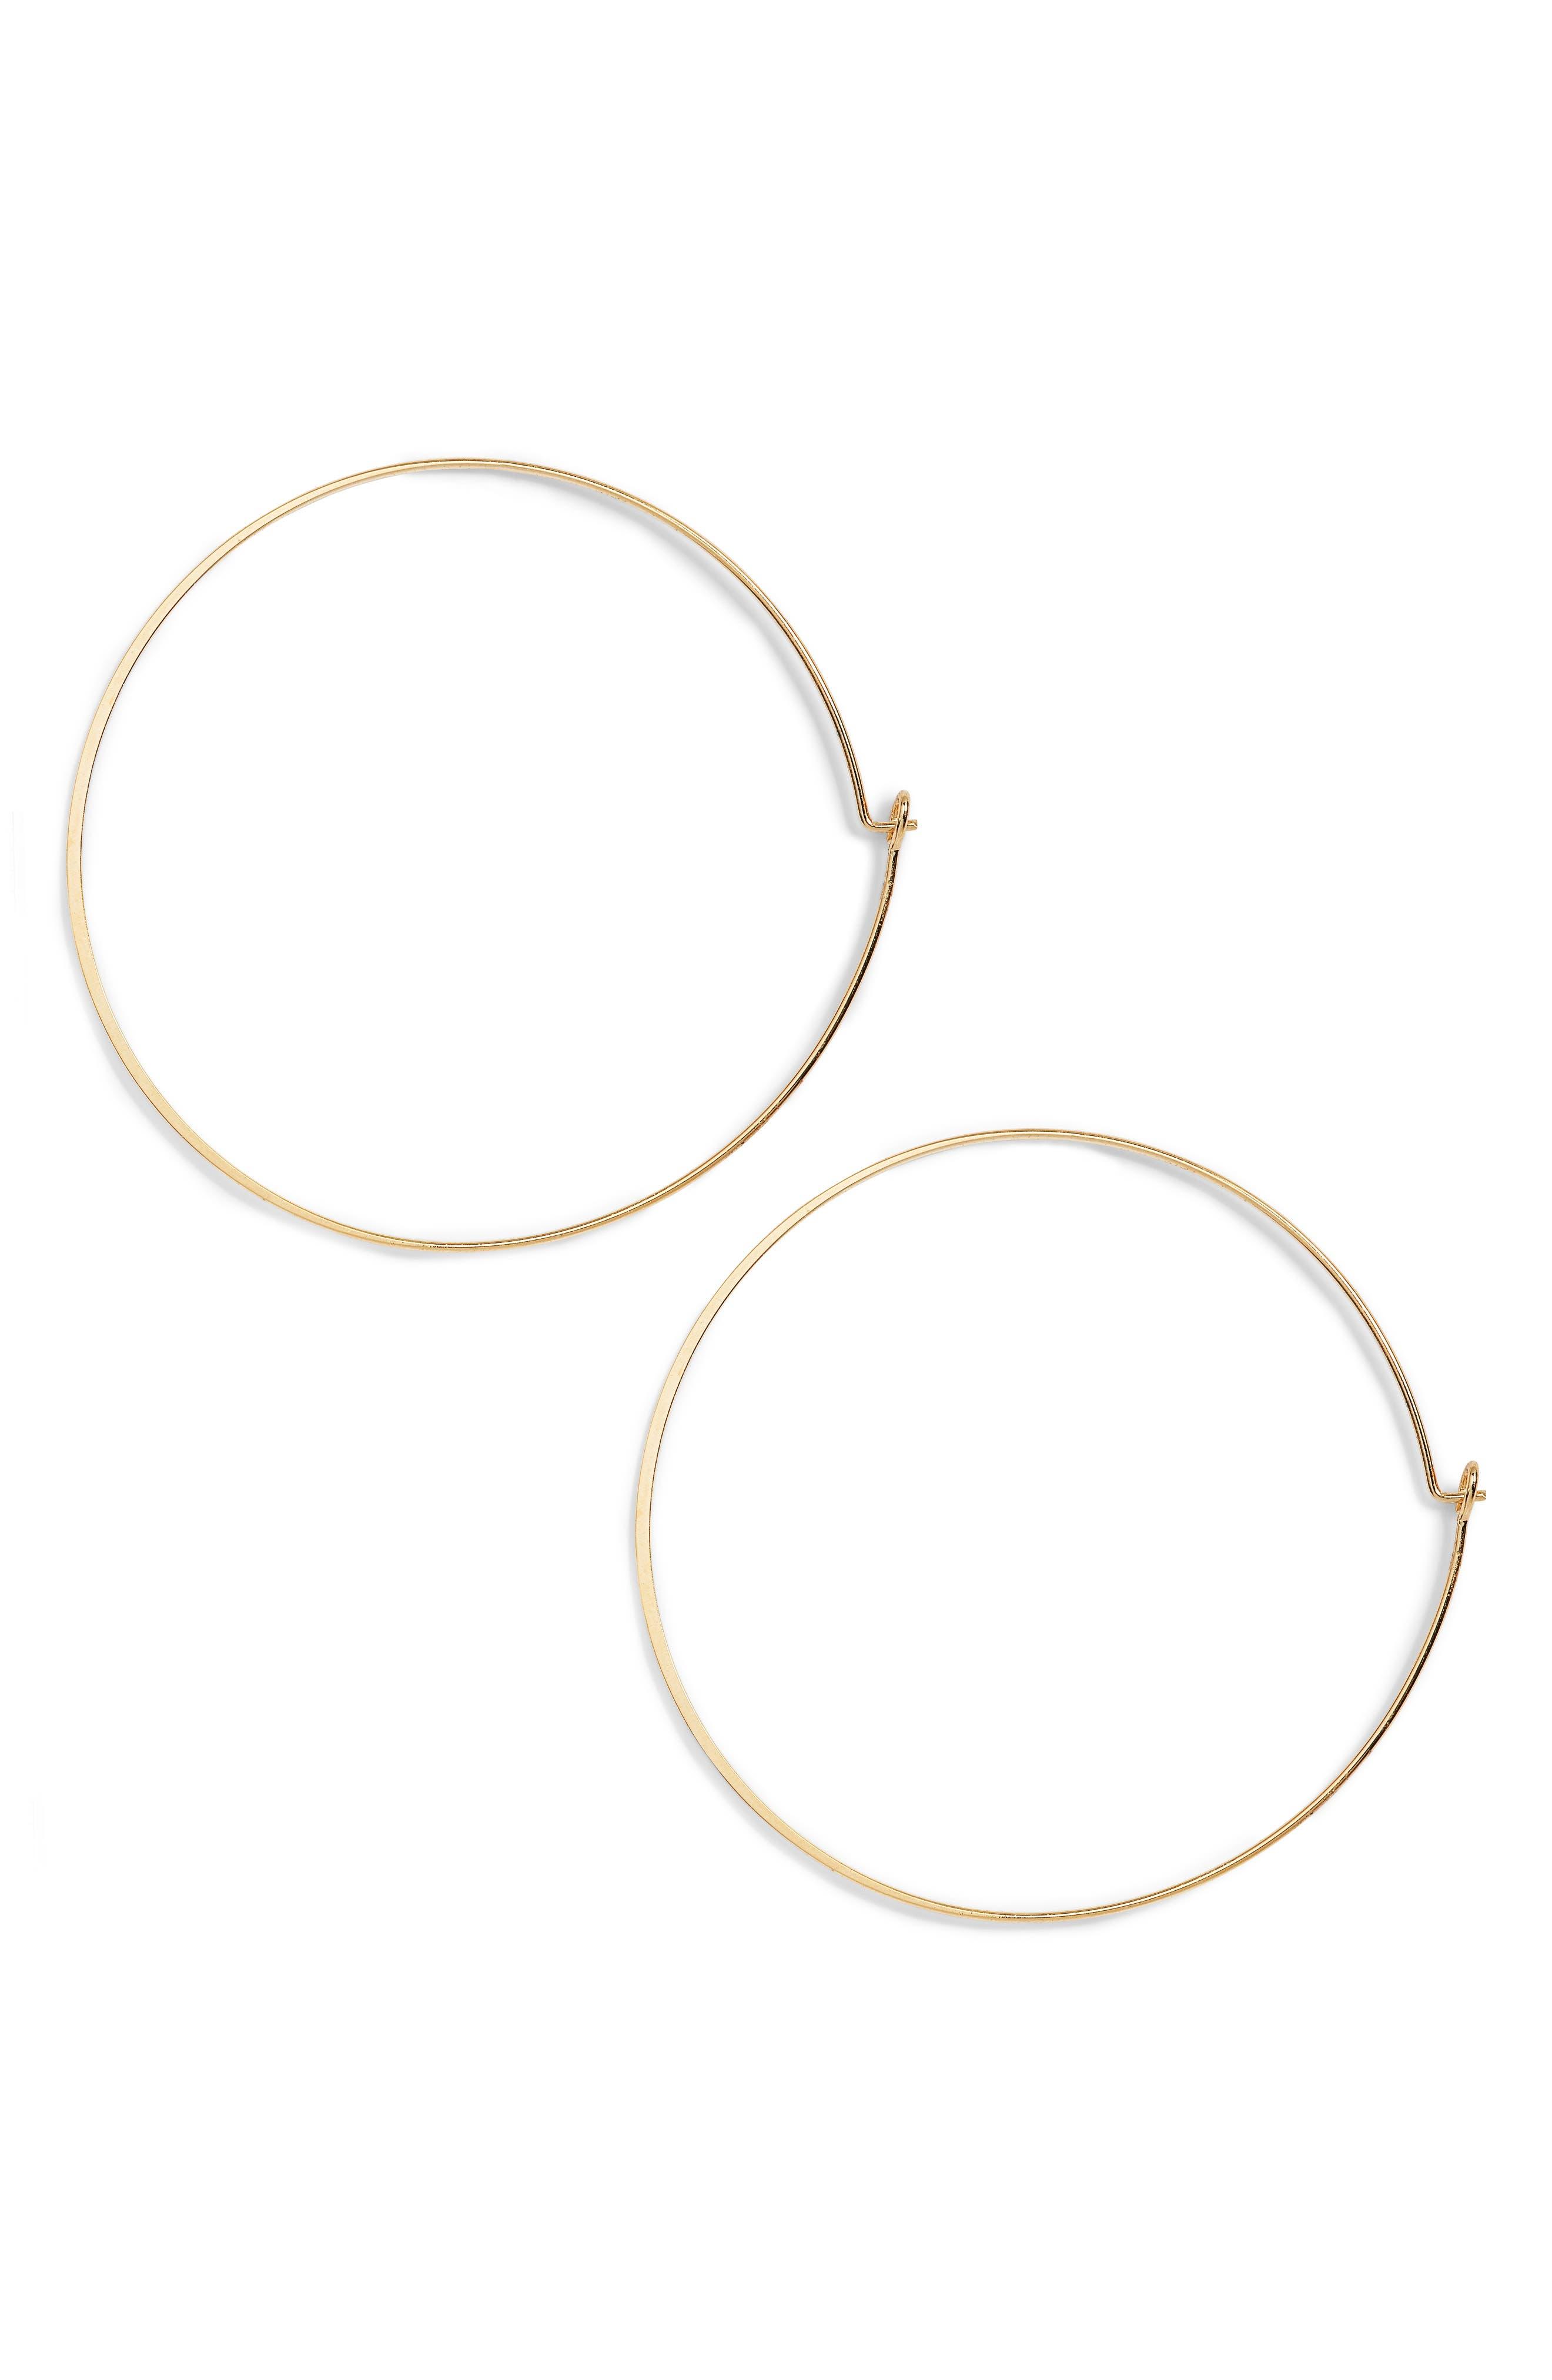 Alternate Image 1 Selected - Jules Smith Suki Hoop Earrings